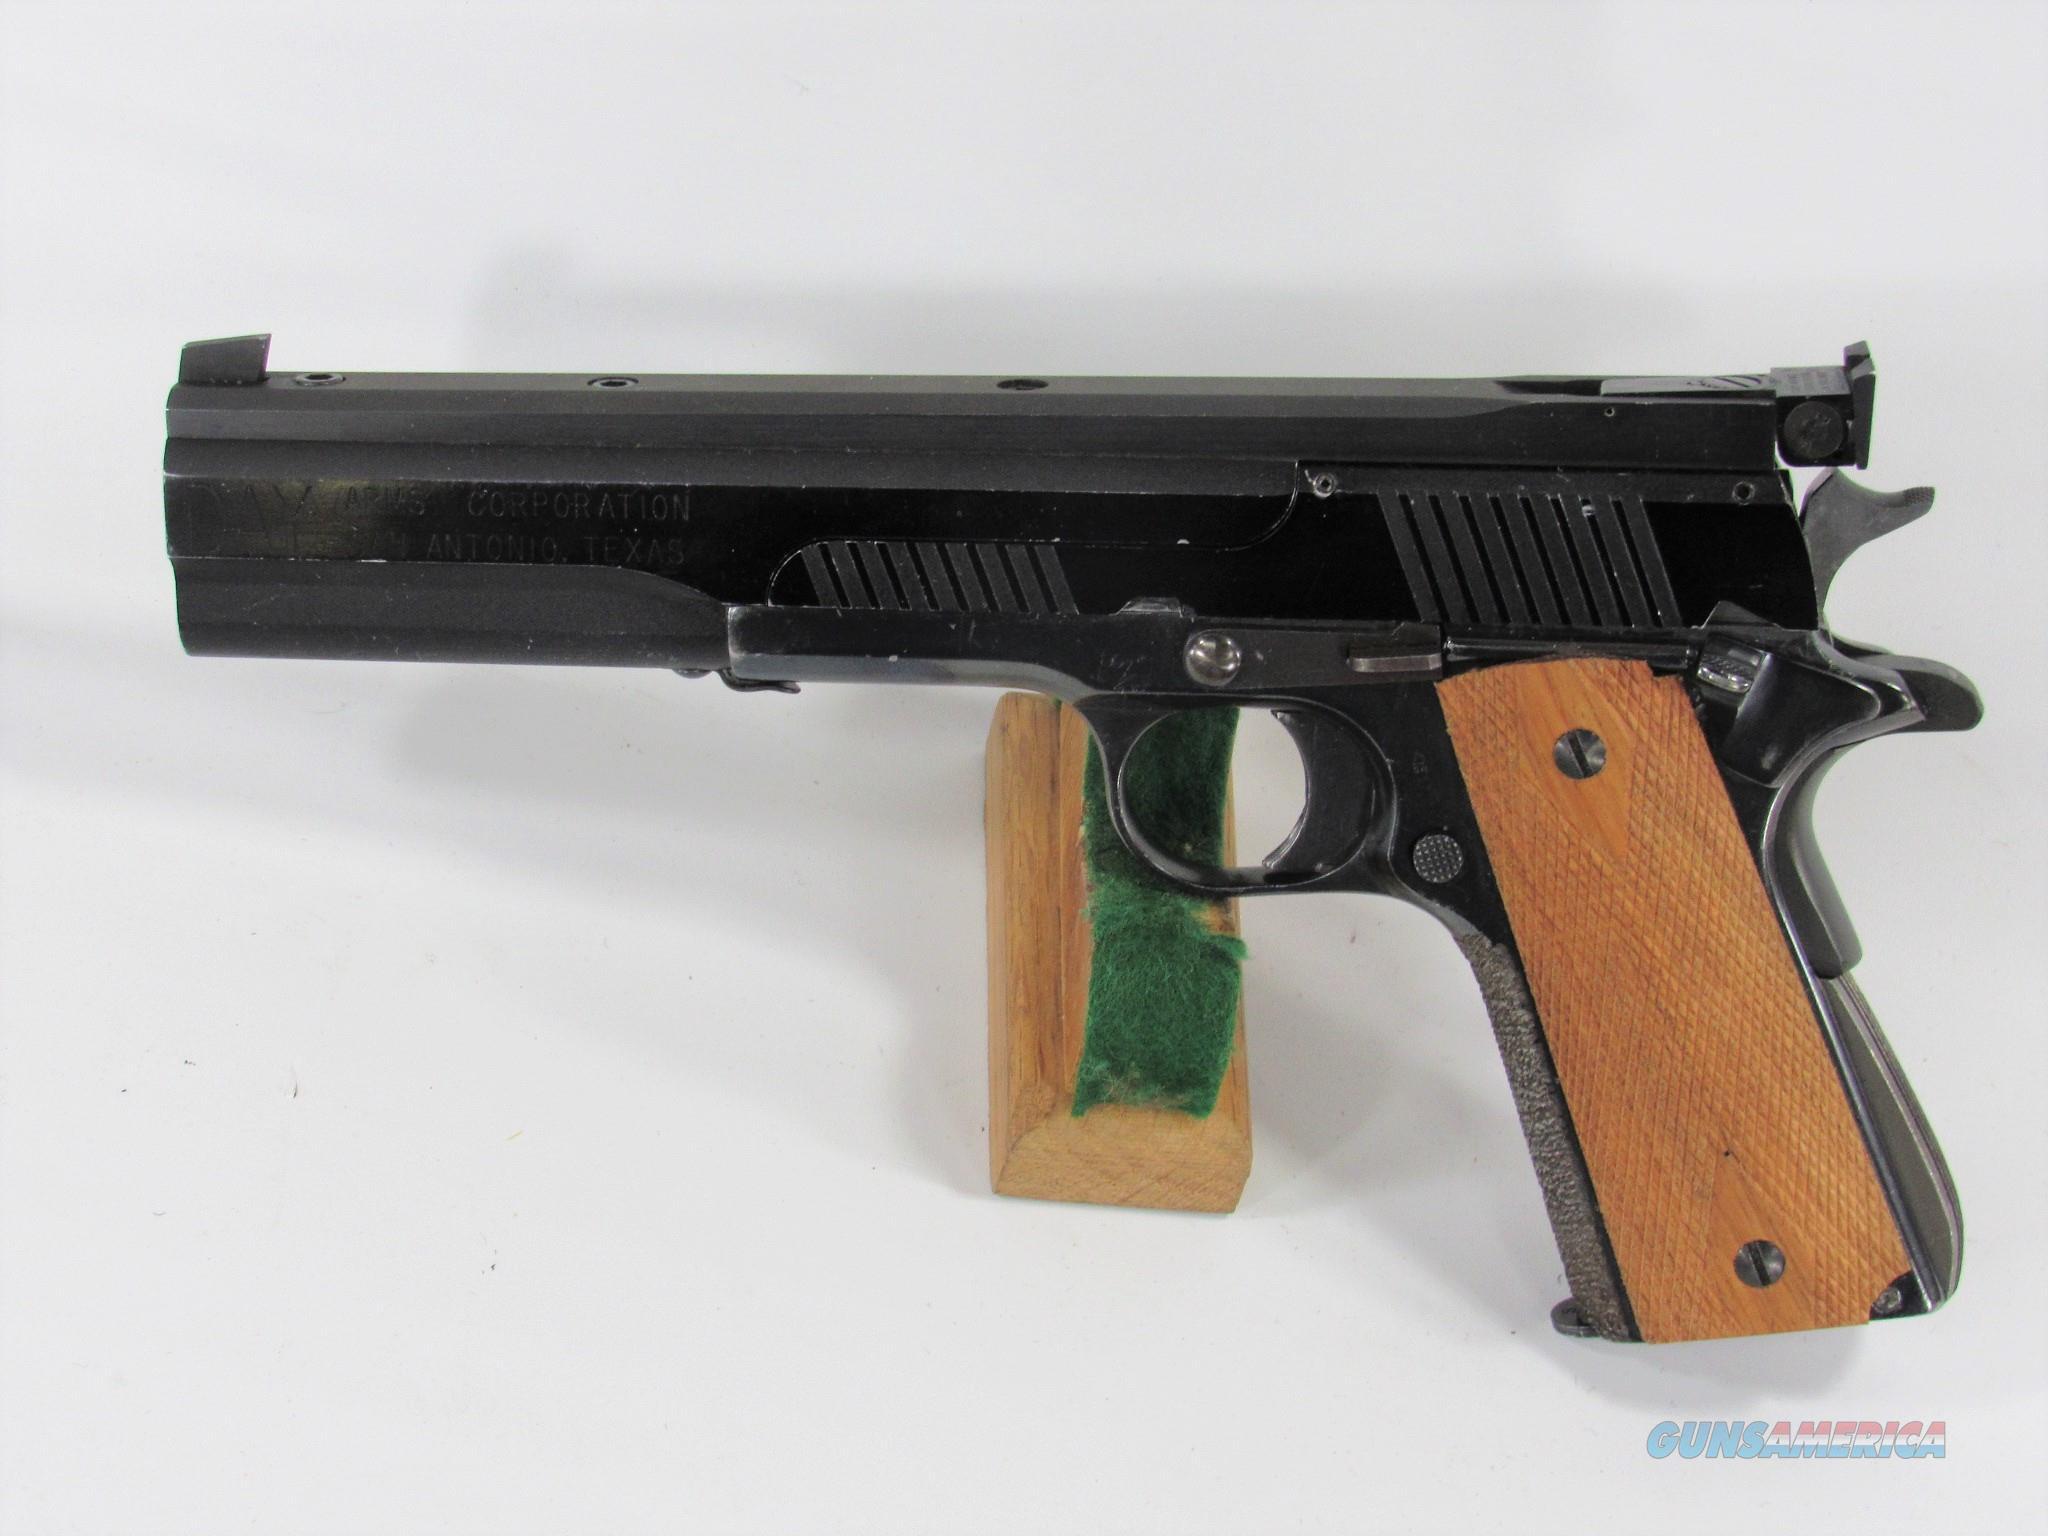 42Y COLT /DAY ARMS CORP. 1911 22  Guns > Pistols > Custom Pistols > 1911 Family